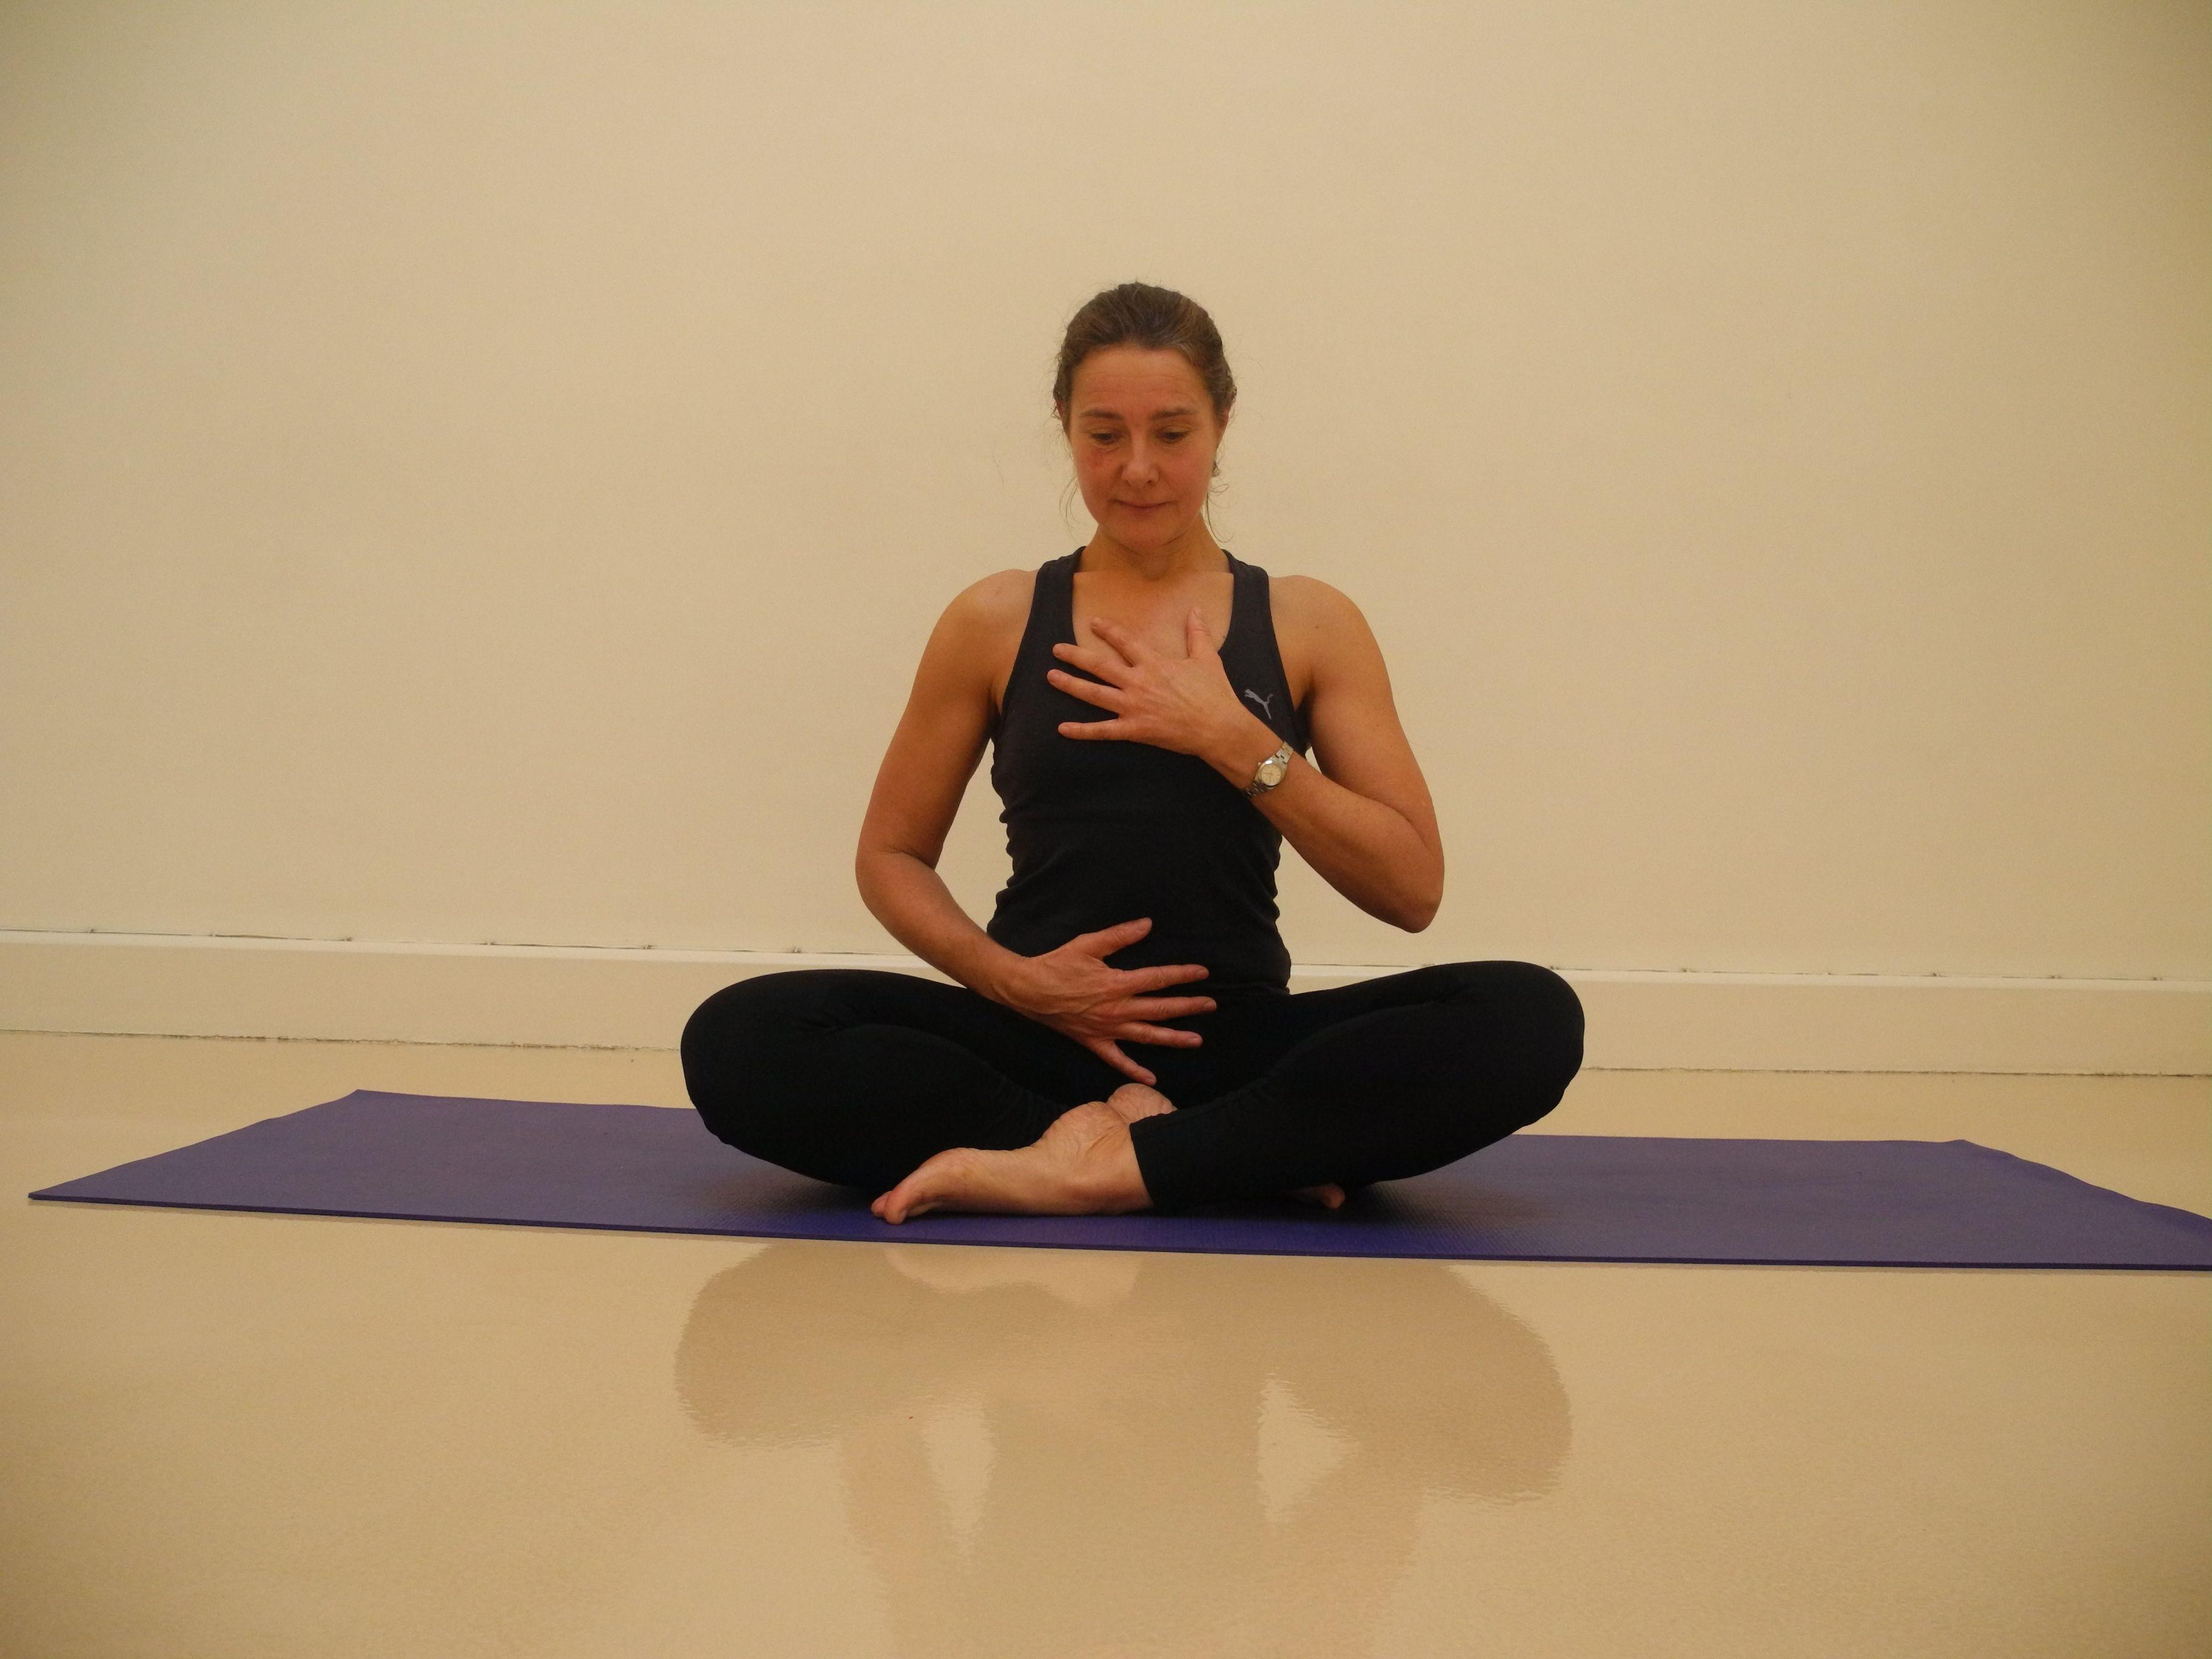 Meditation exercise for decision making | Meditation ...